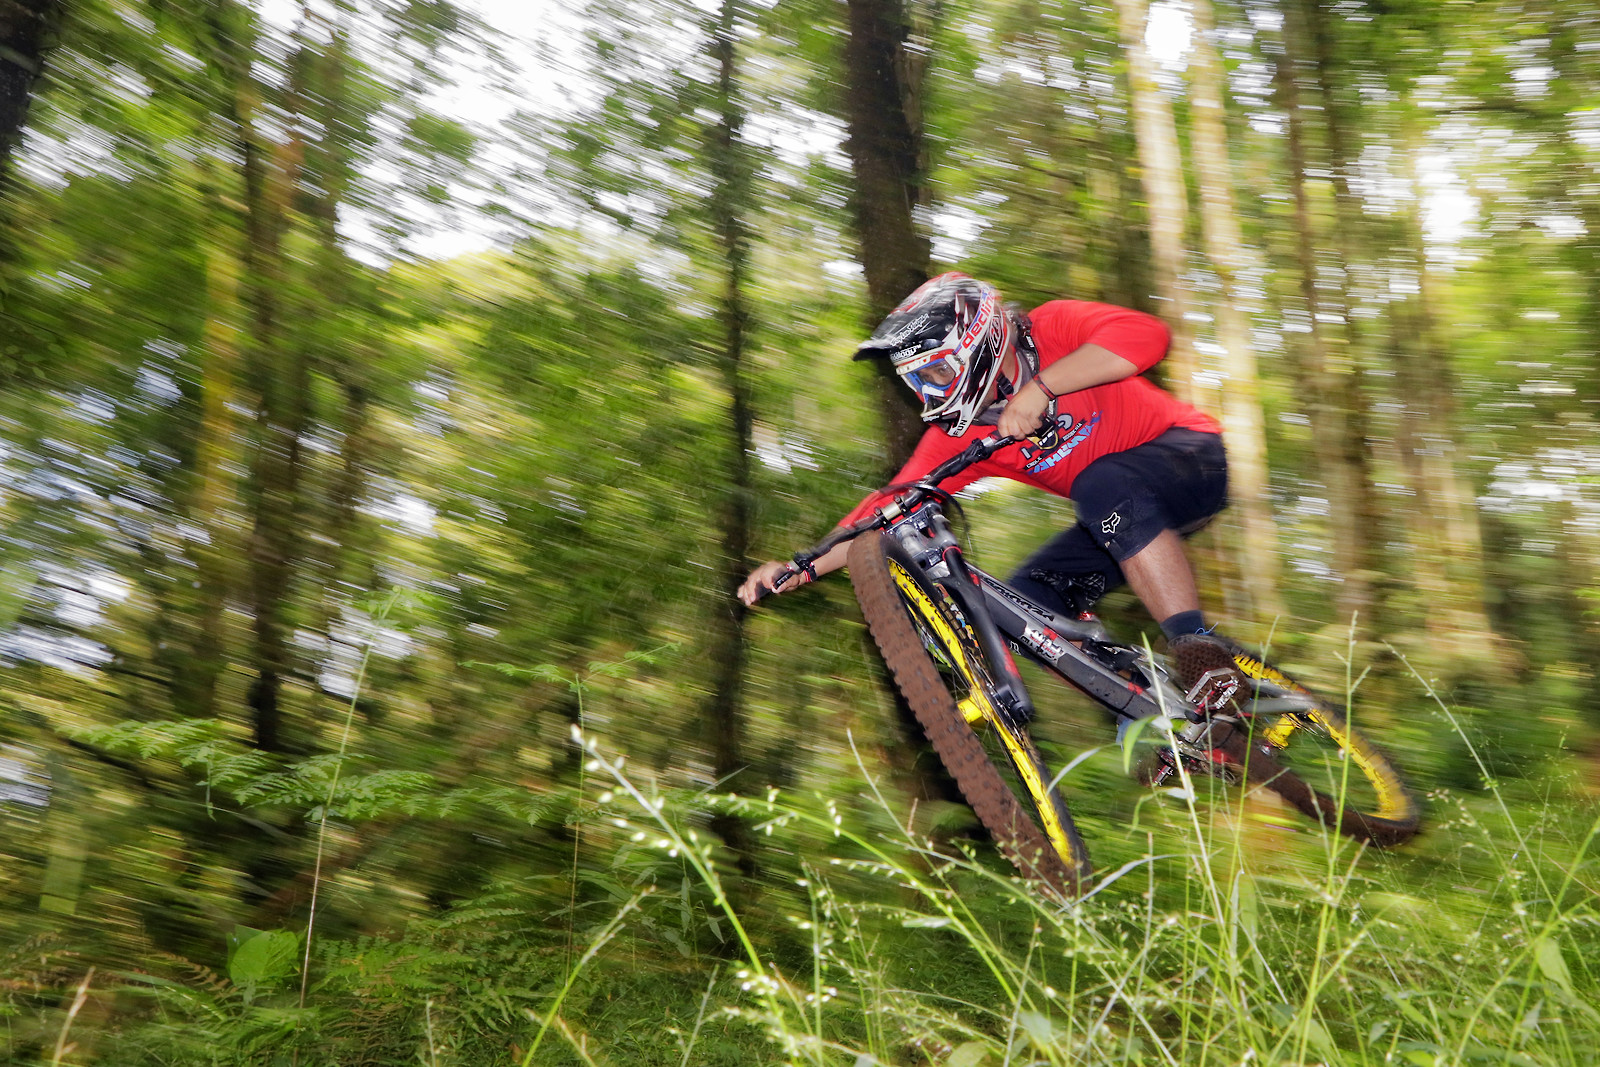 The Green Room  - bismojo - Mountain Biking Pictures - Vital MTB